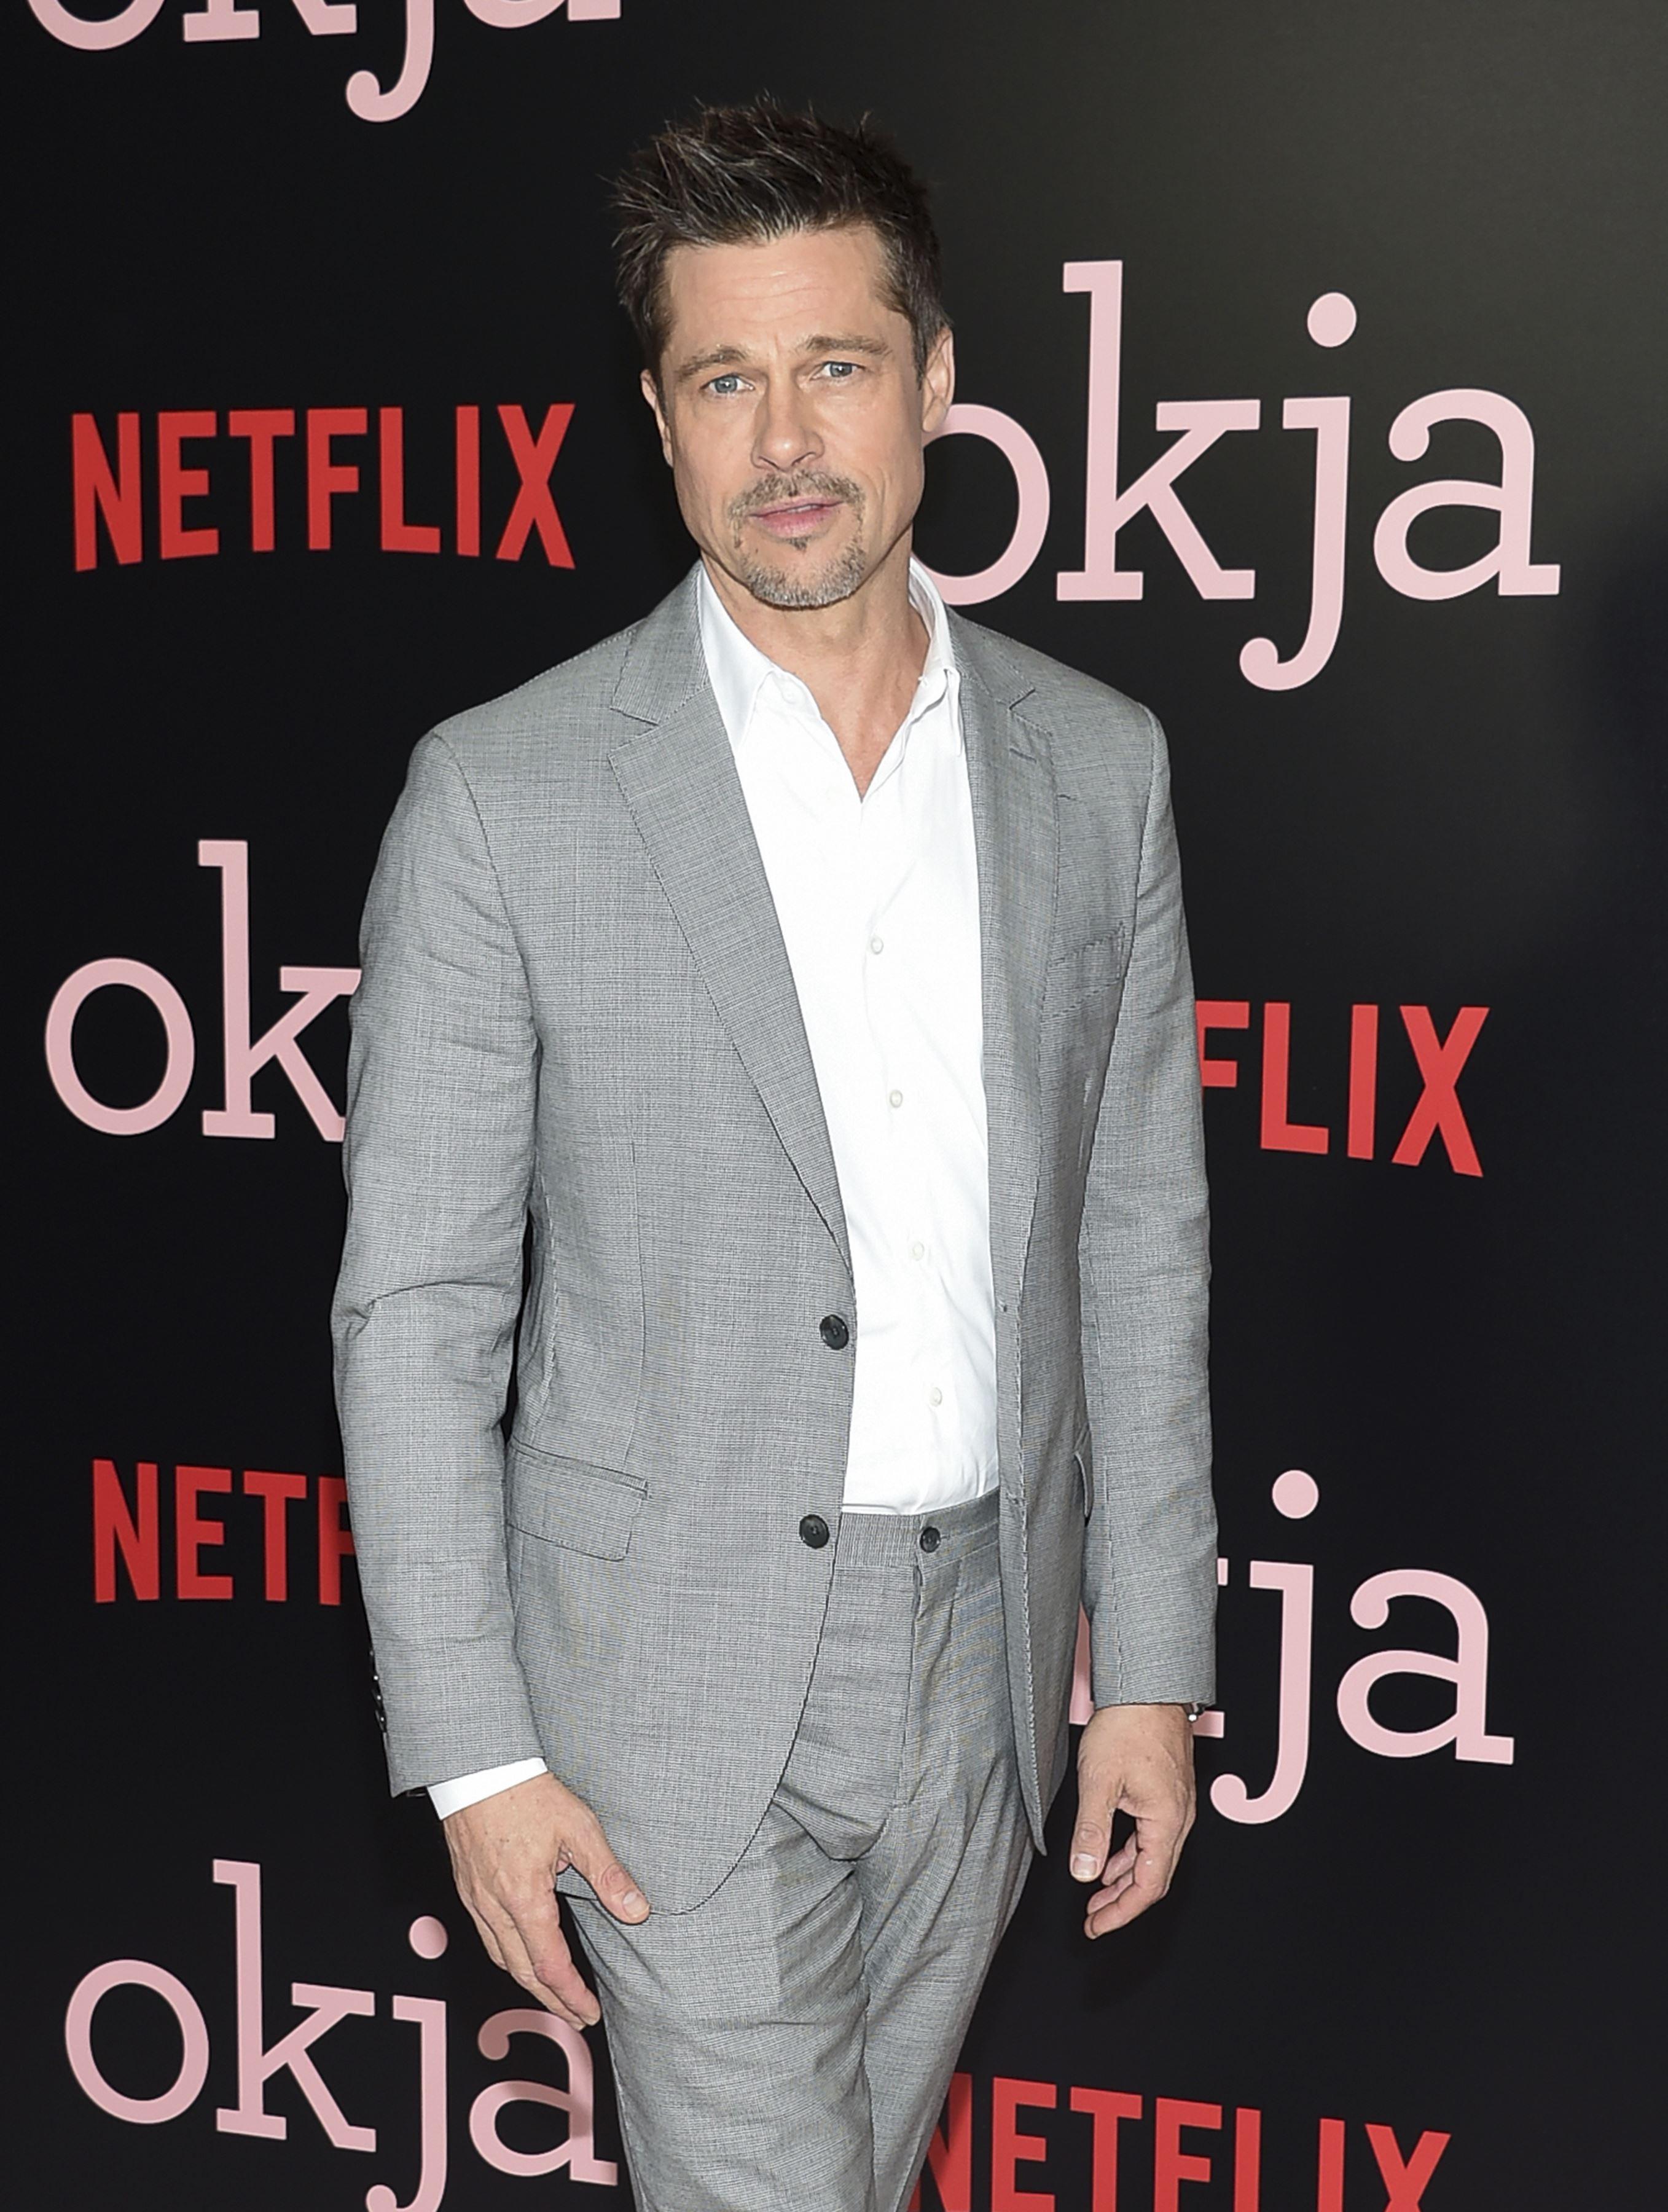 Brad Pitt Bid 120,000 to Watch Game of Thrones' With Emilia Clarkebut Was Outbid Brad Pitt Bid 120,000 to Watch Game of Thrones' With Emilia Clarkebut Was Outbid new foto